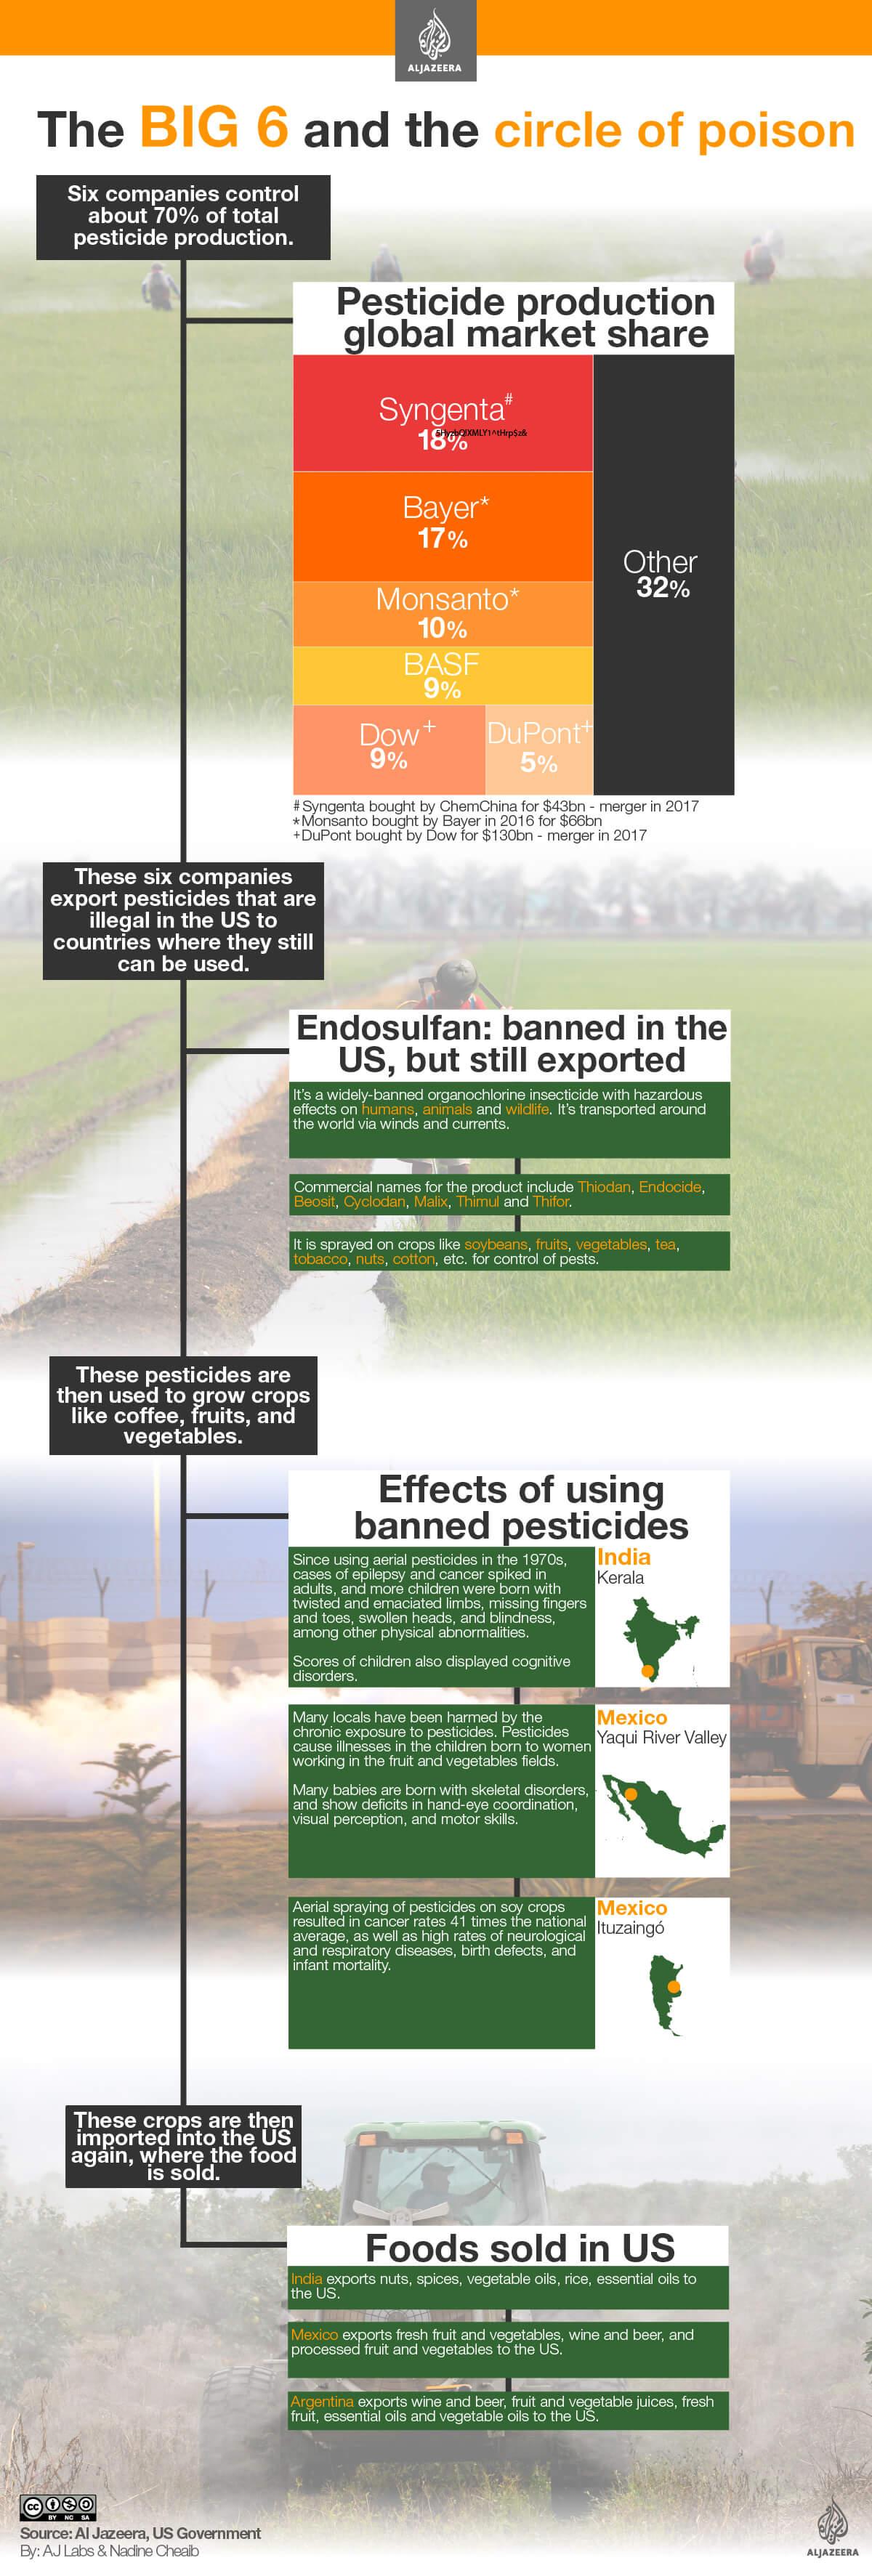 big-6-circle-poison-environ-aljazeera-infograhic-pesticide-corporations